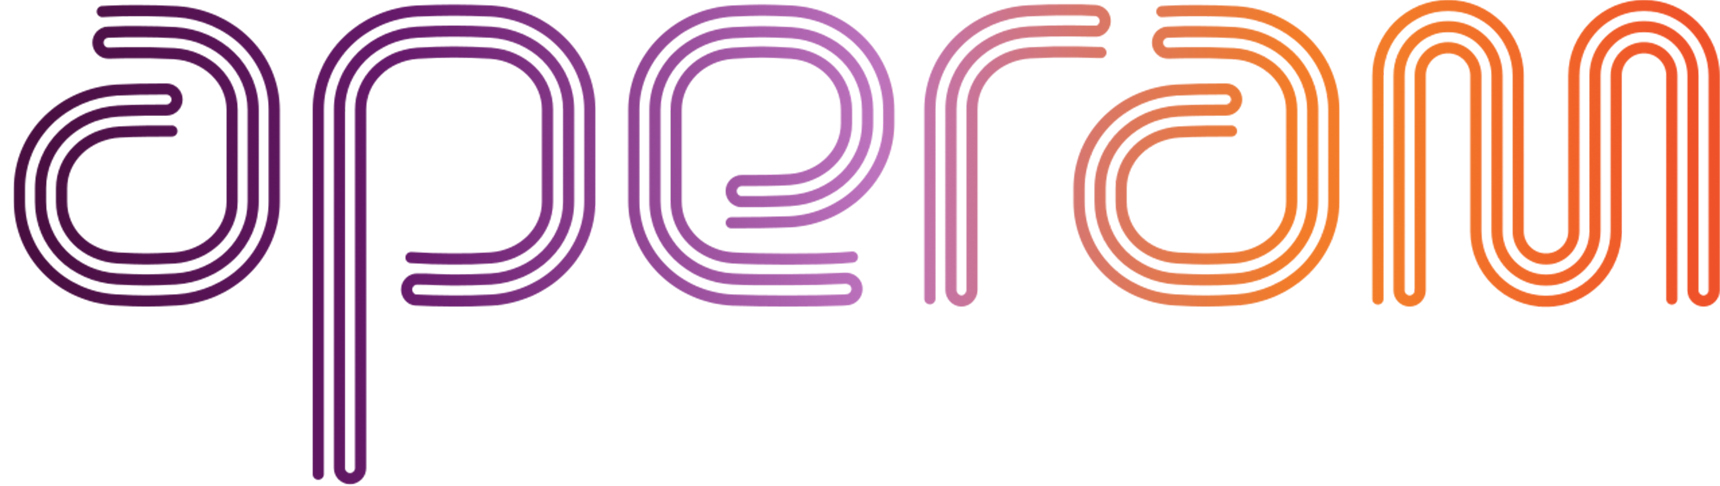 Aperam logo Metalfinish Group